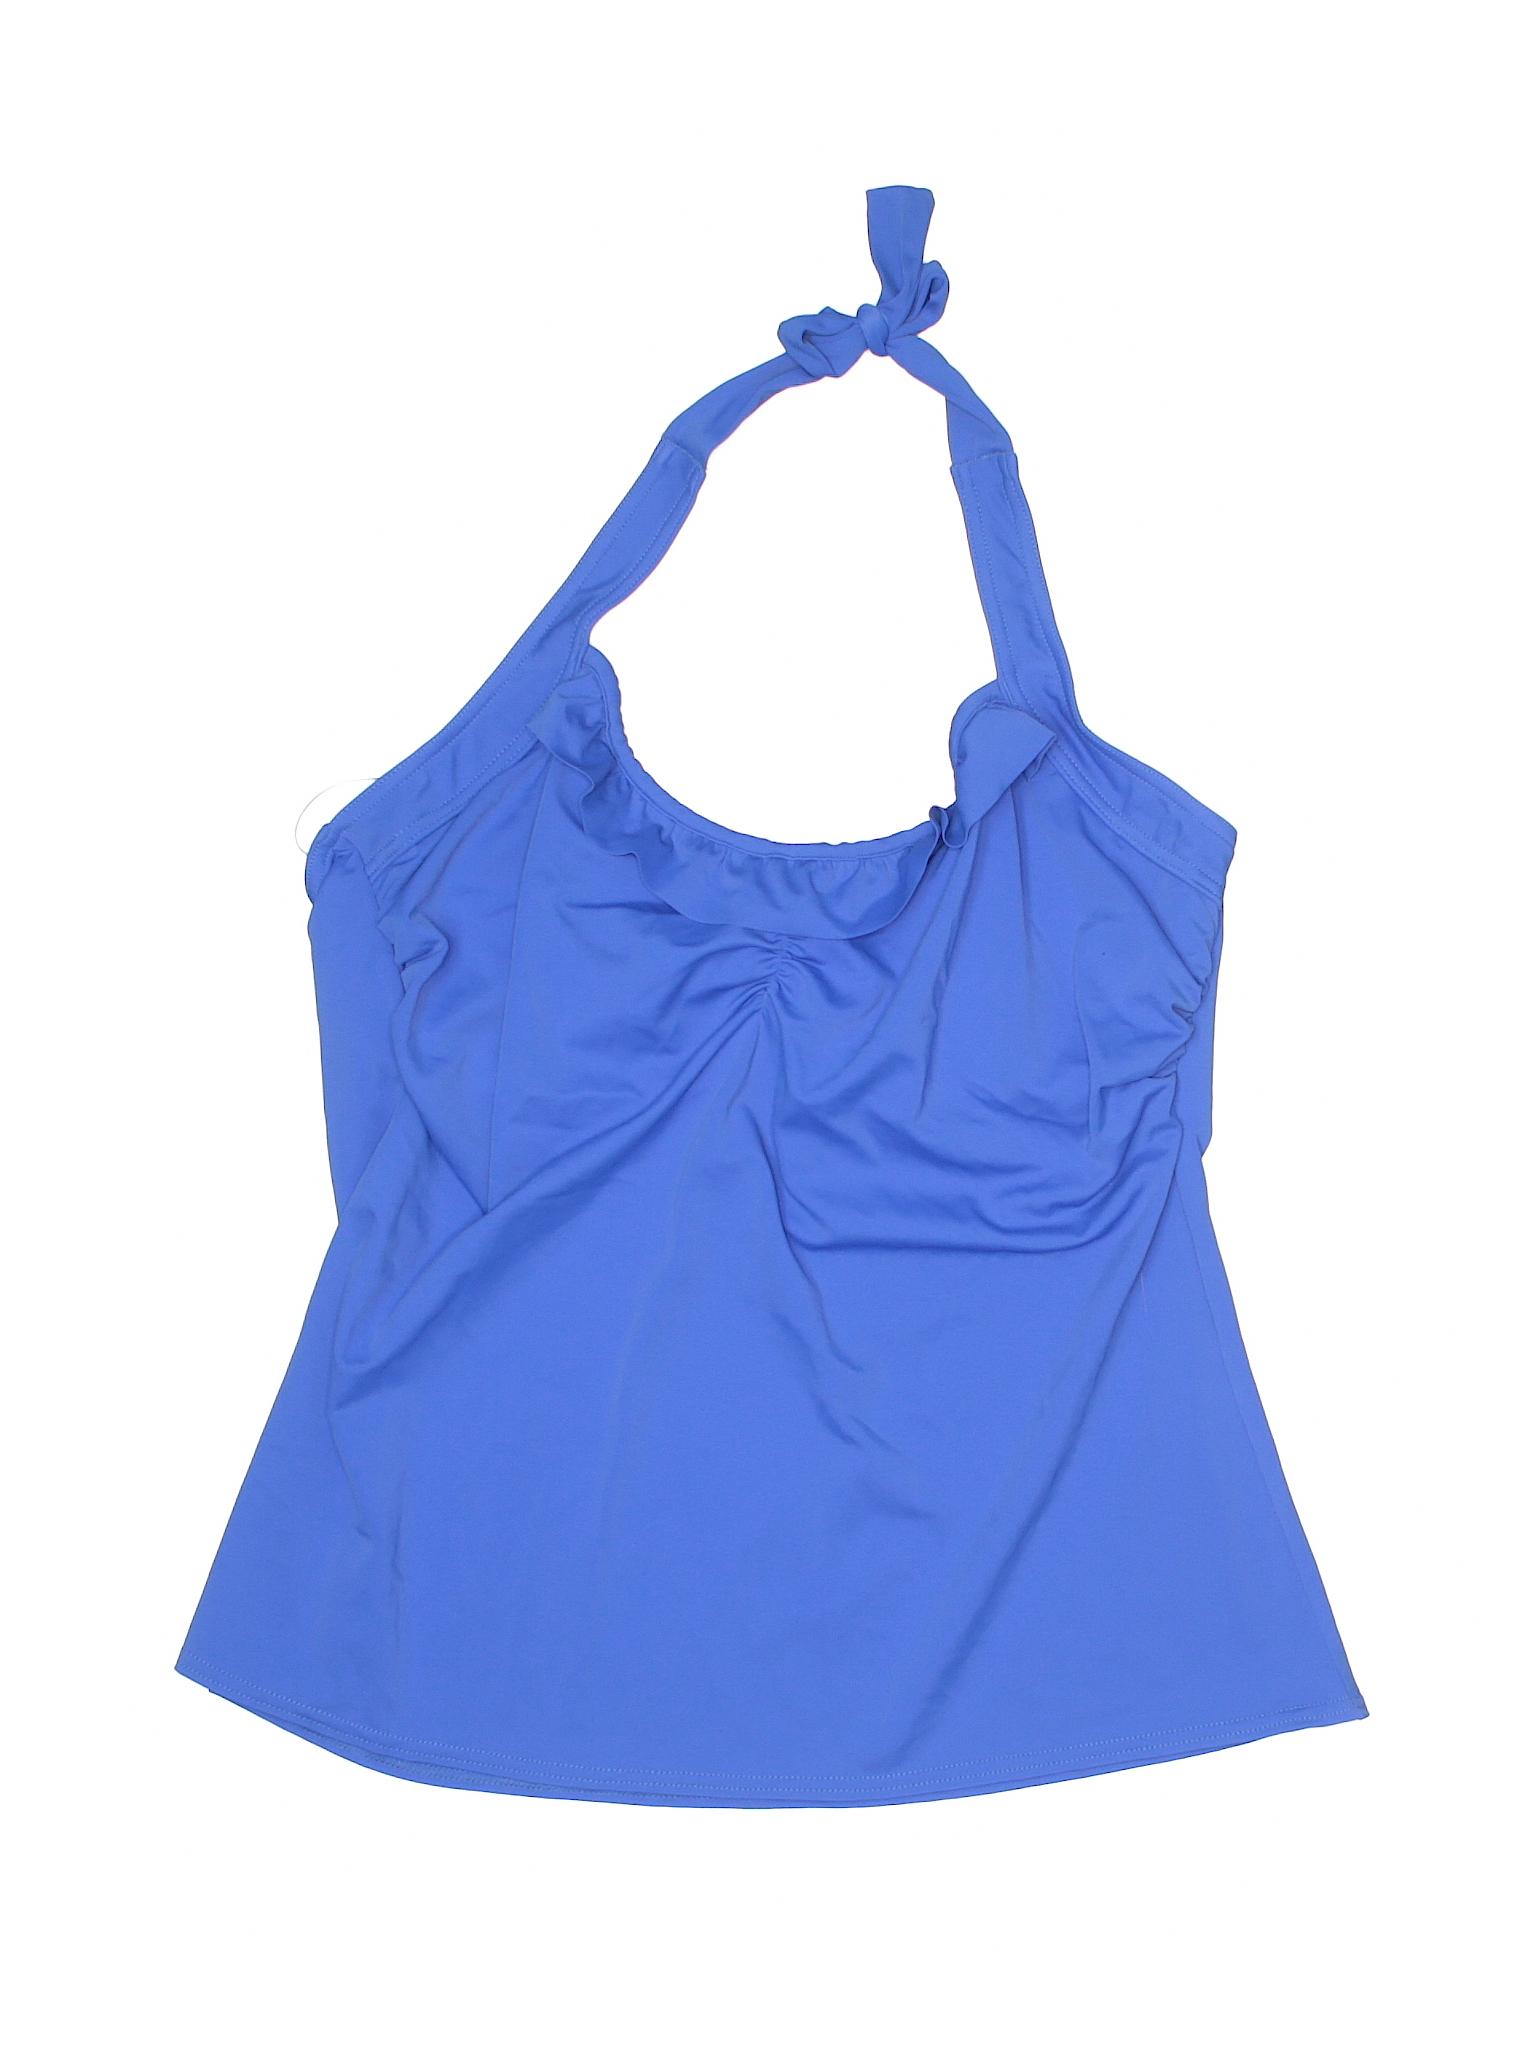 Top Boutique Swimsuit Freya Swimsuit Top Boutique Freya Boutique qxwxdE4TS